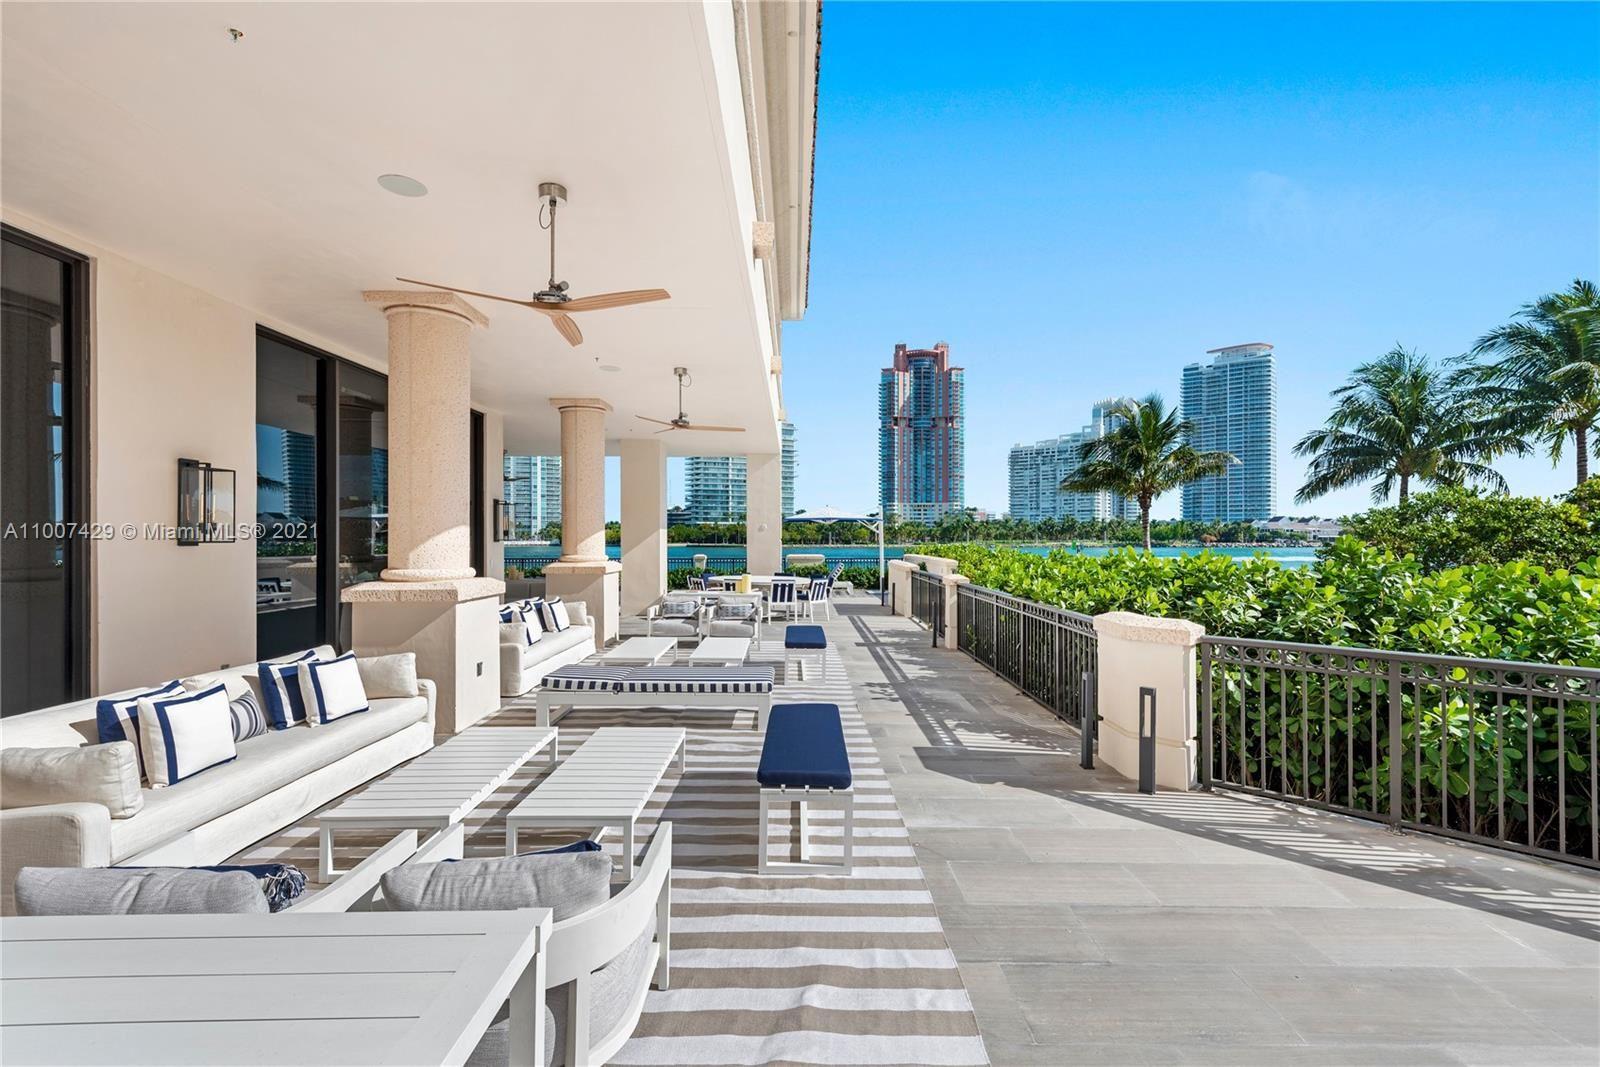 Photo of 6800 Fisher Island Dr #6812, Miami Beach, FL 33109 (MLS # A11007429)